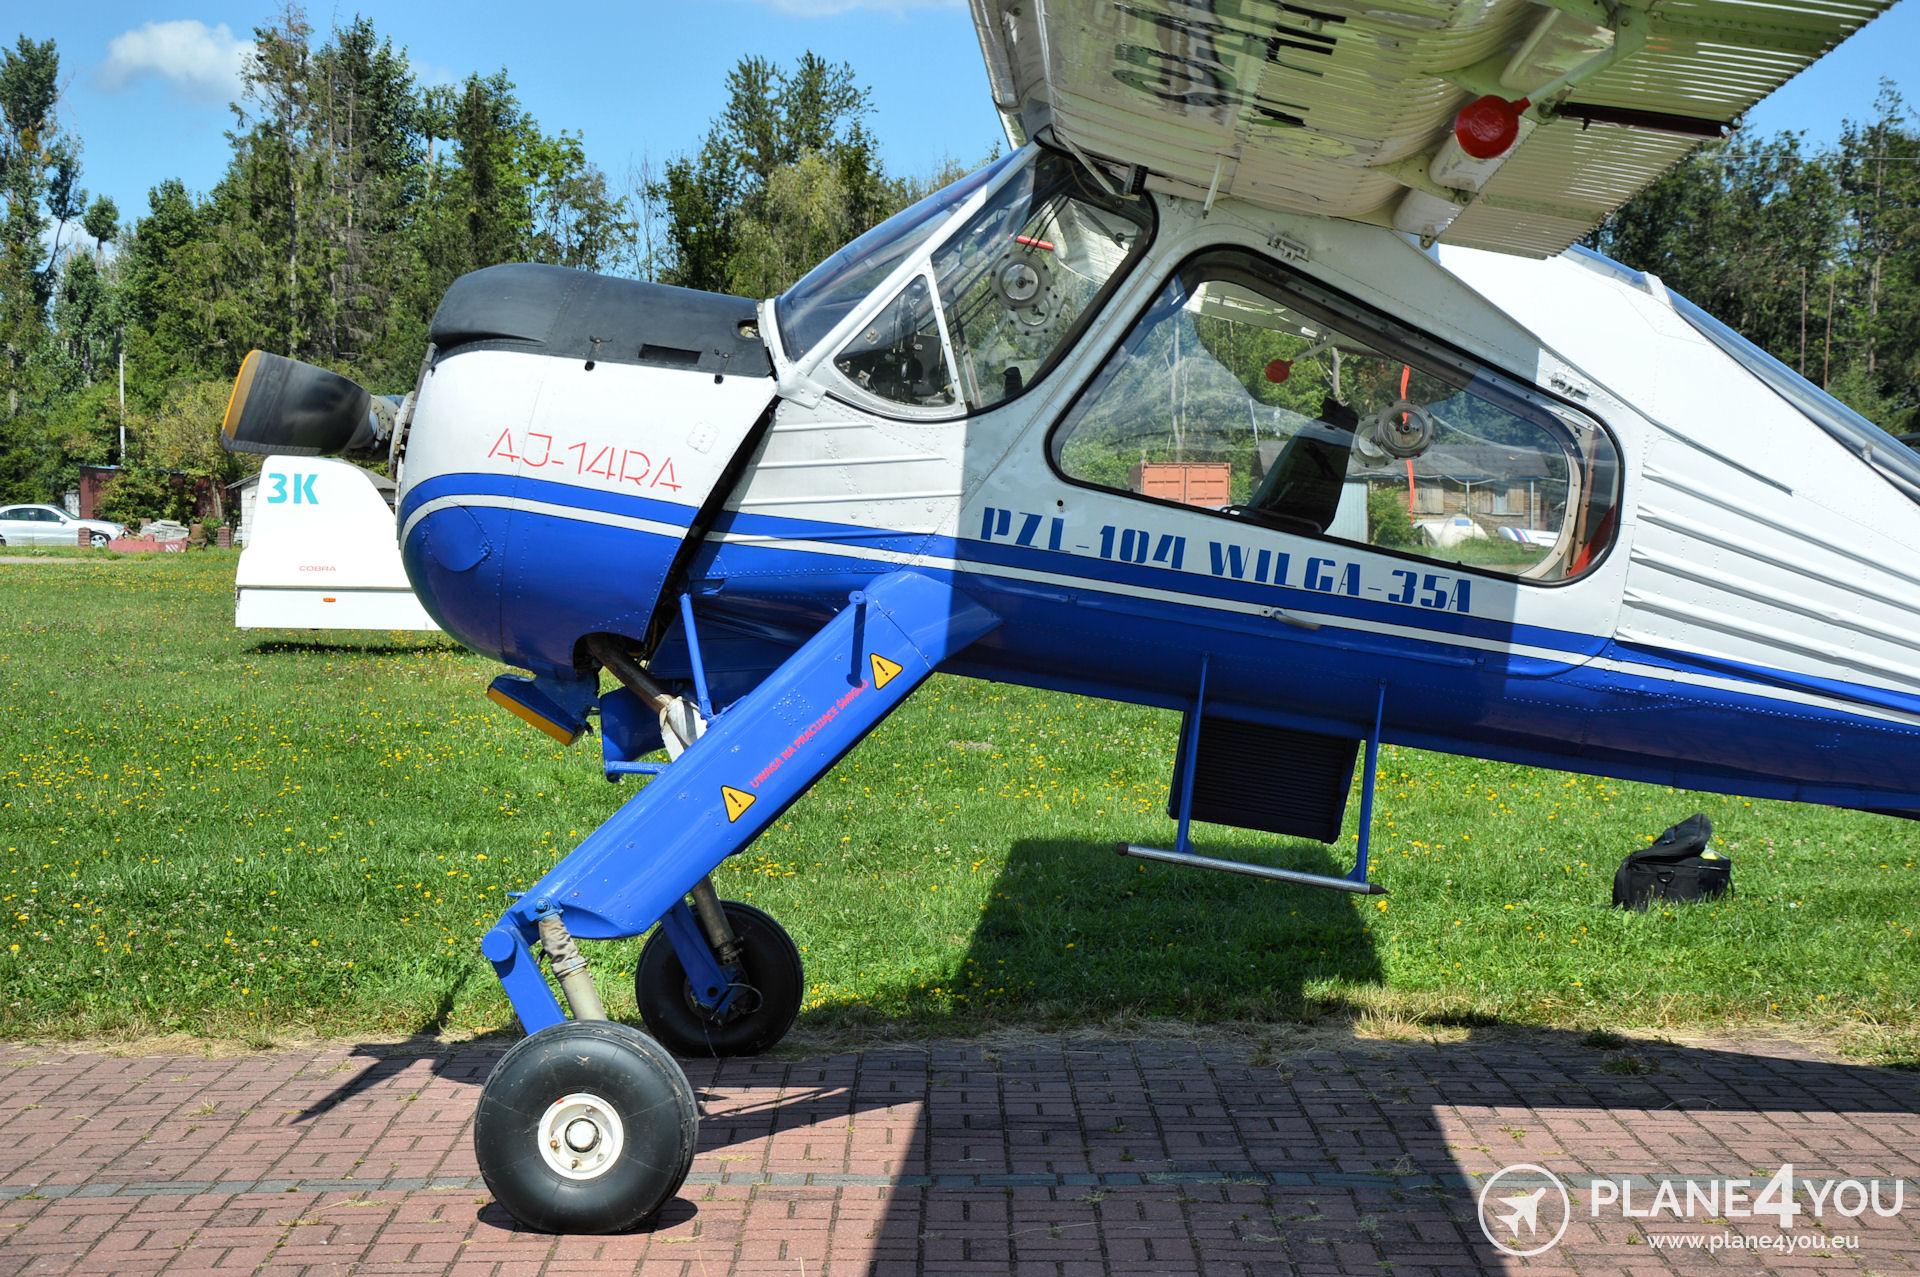 119  PZL104 Wilga 35A SP-AHY   Sold aircraft   Plane4You